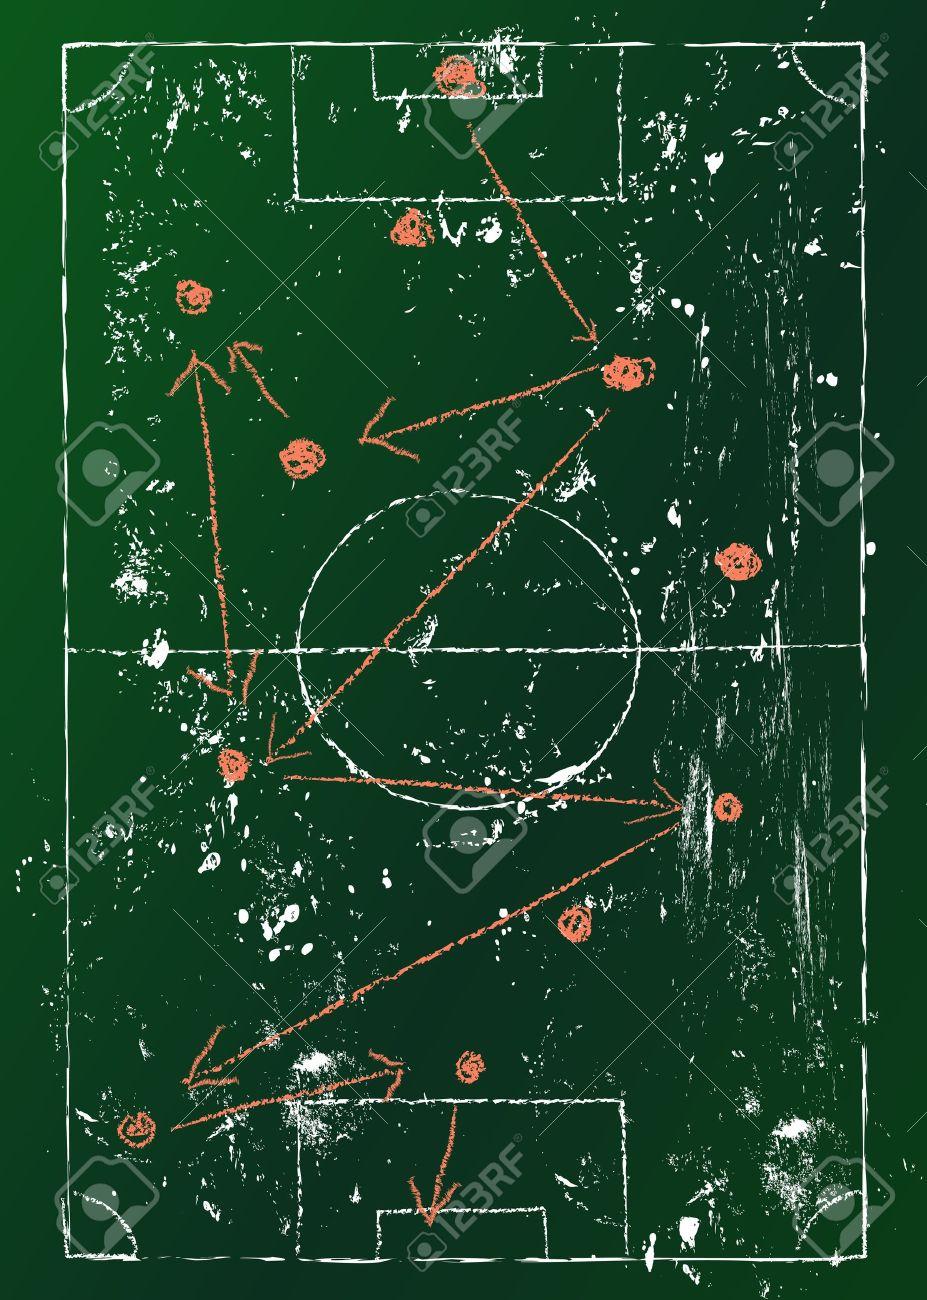 Soccer Tactics Diagram Grungy Royalty Free Cliparts Vectors And